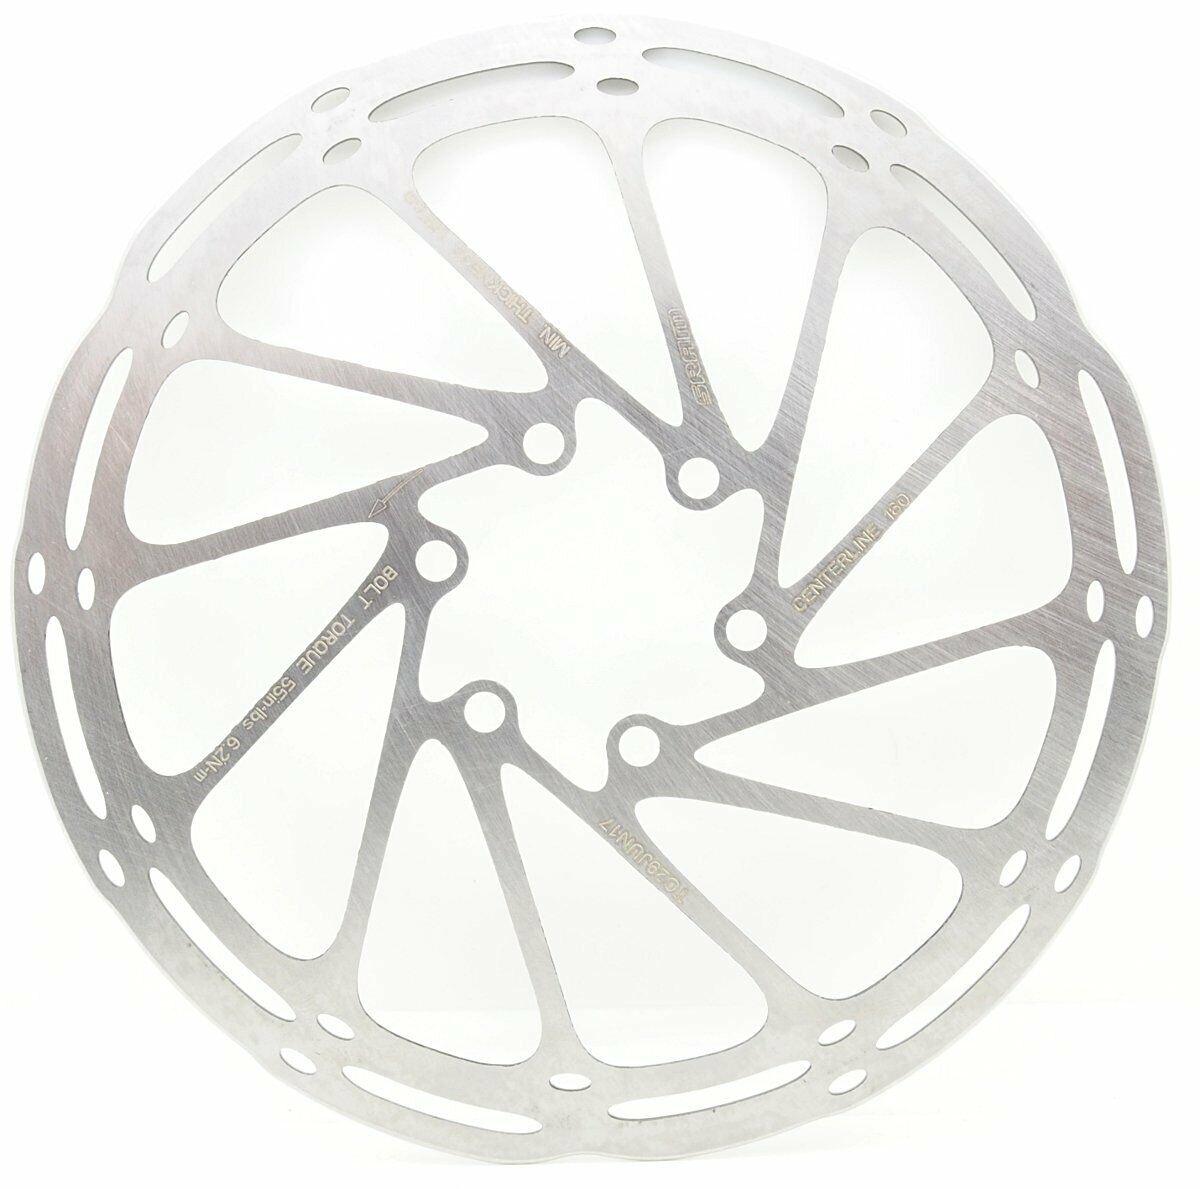 NIB AVID Sram Centerline Disc Brake 6-Bolt Rotor w// ROUNDED Edges 160mm